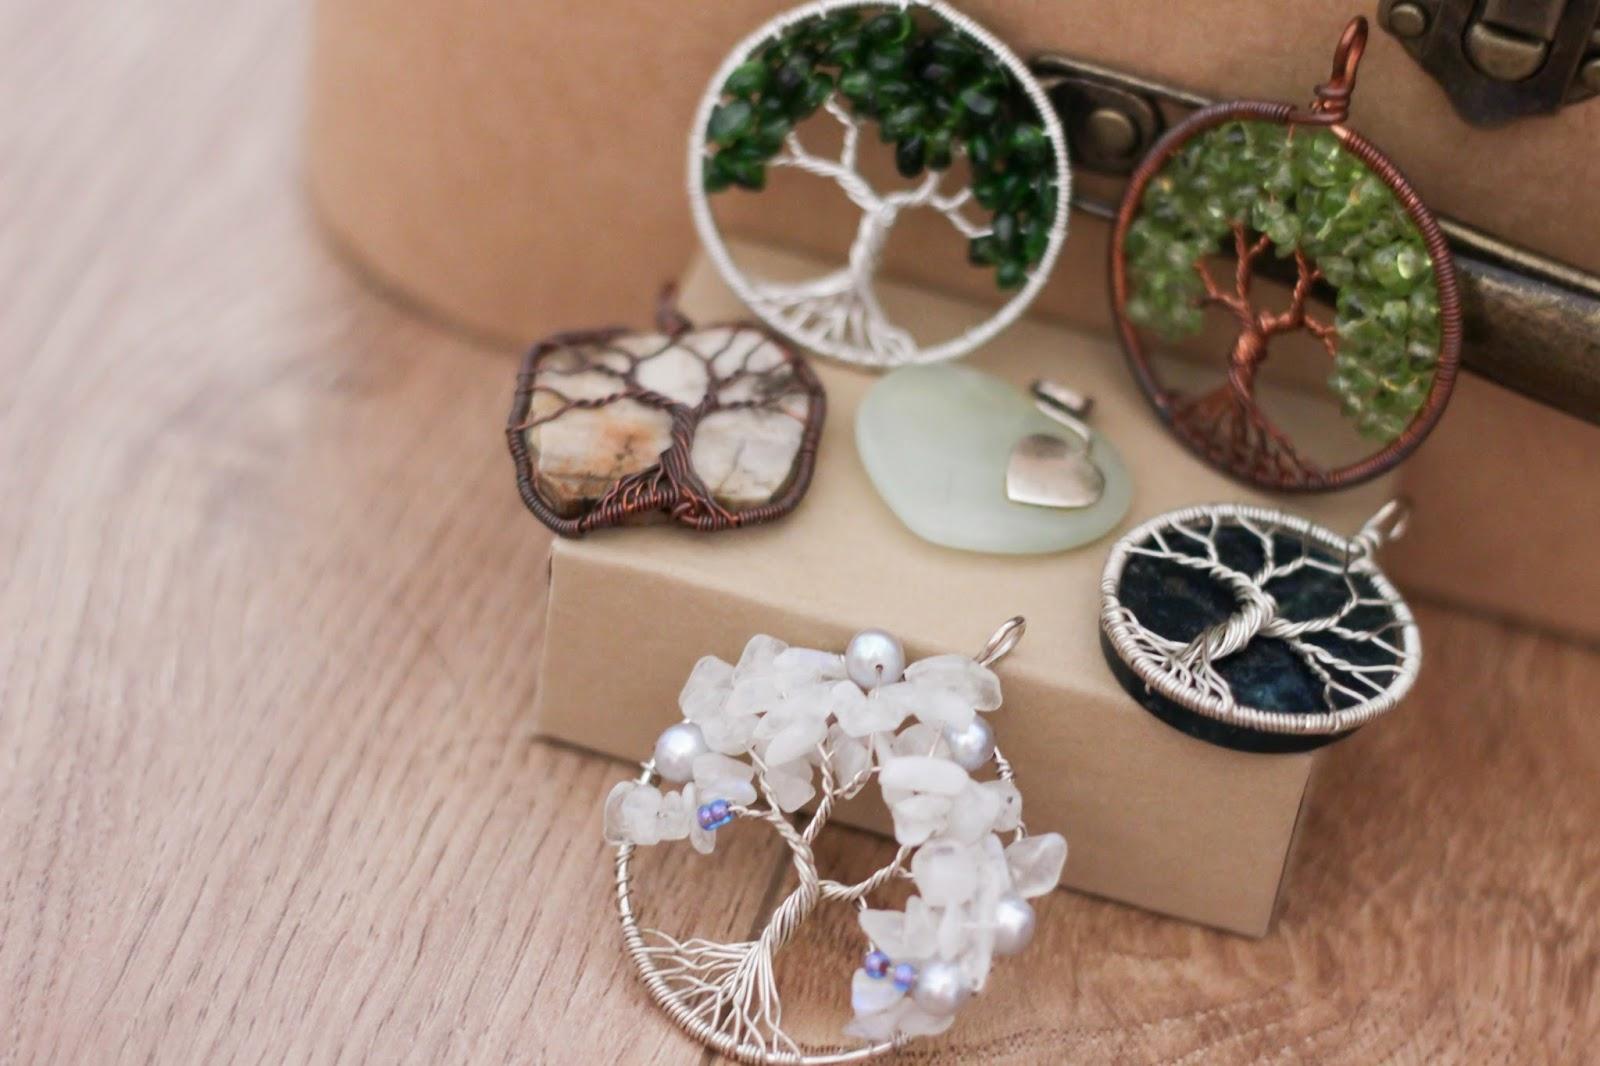 healing gemstone necklaces